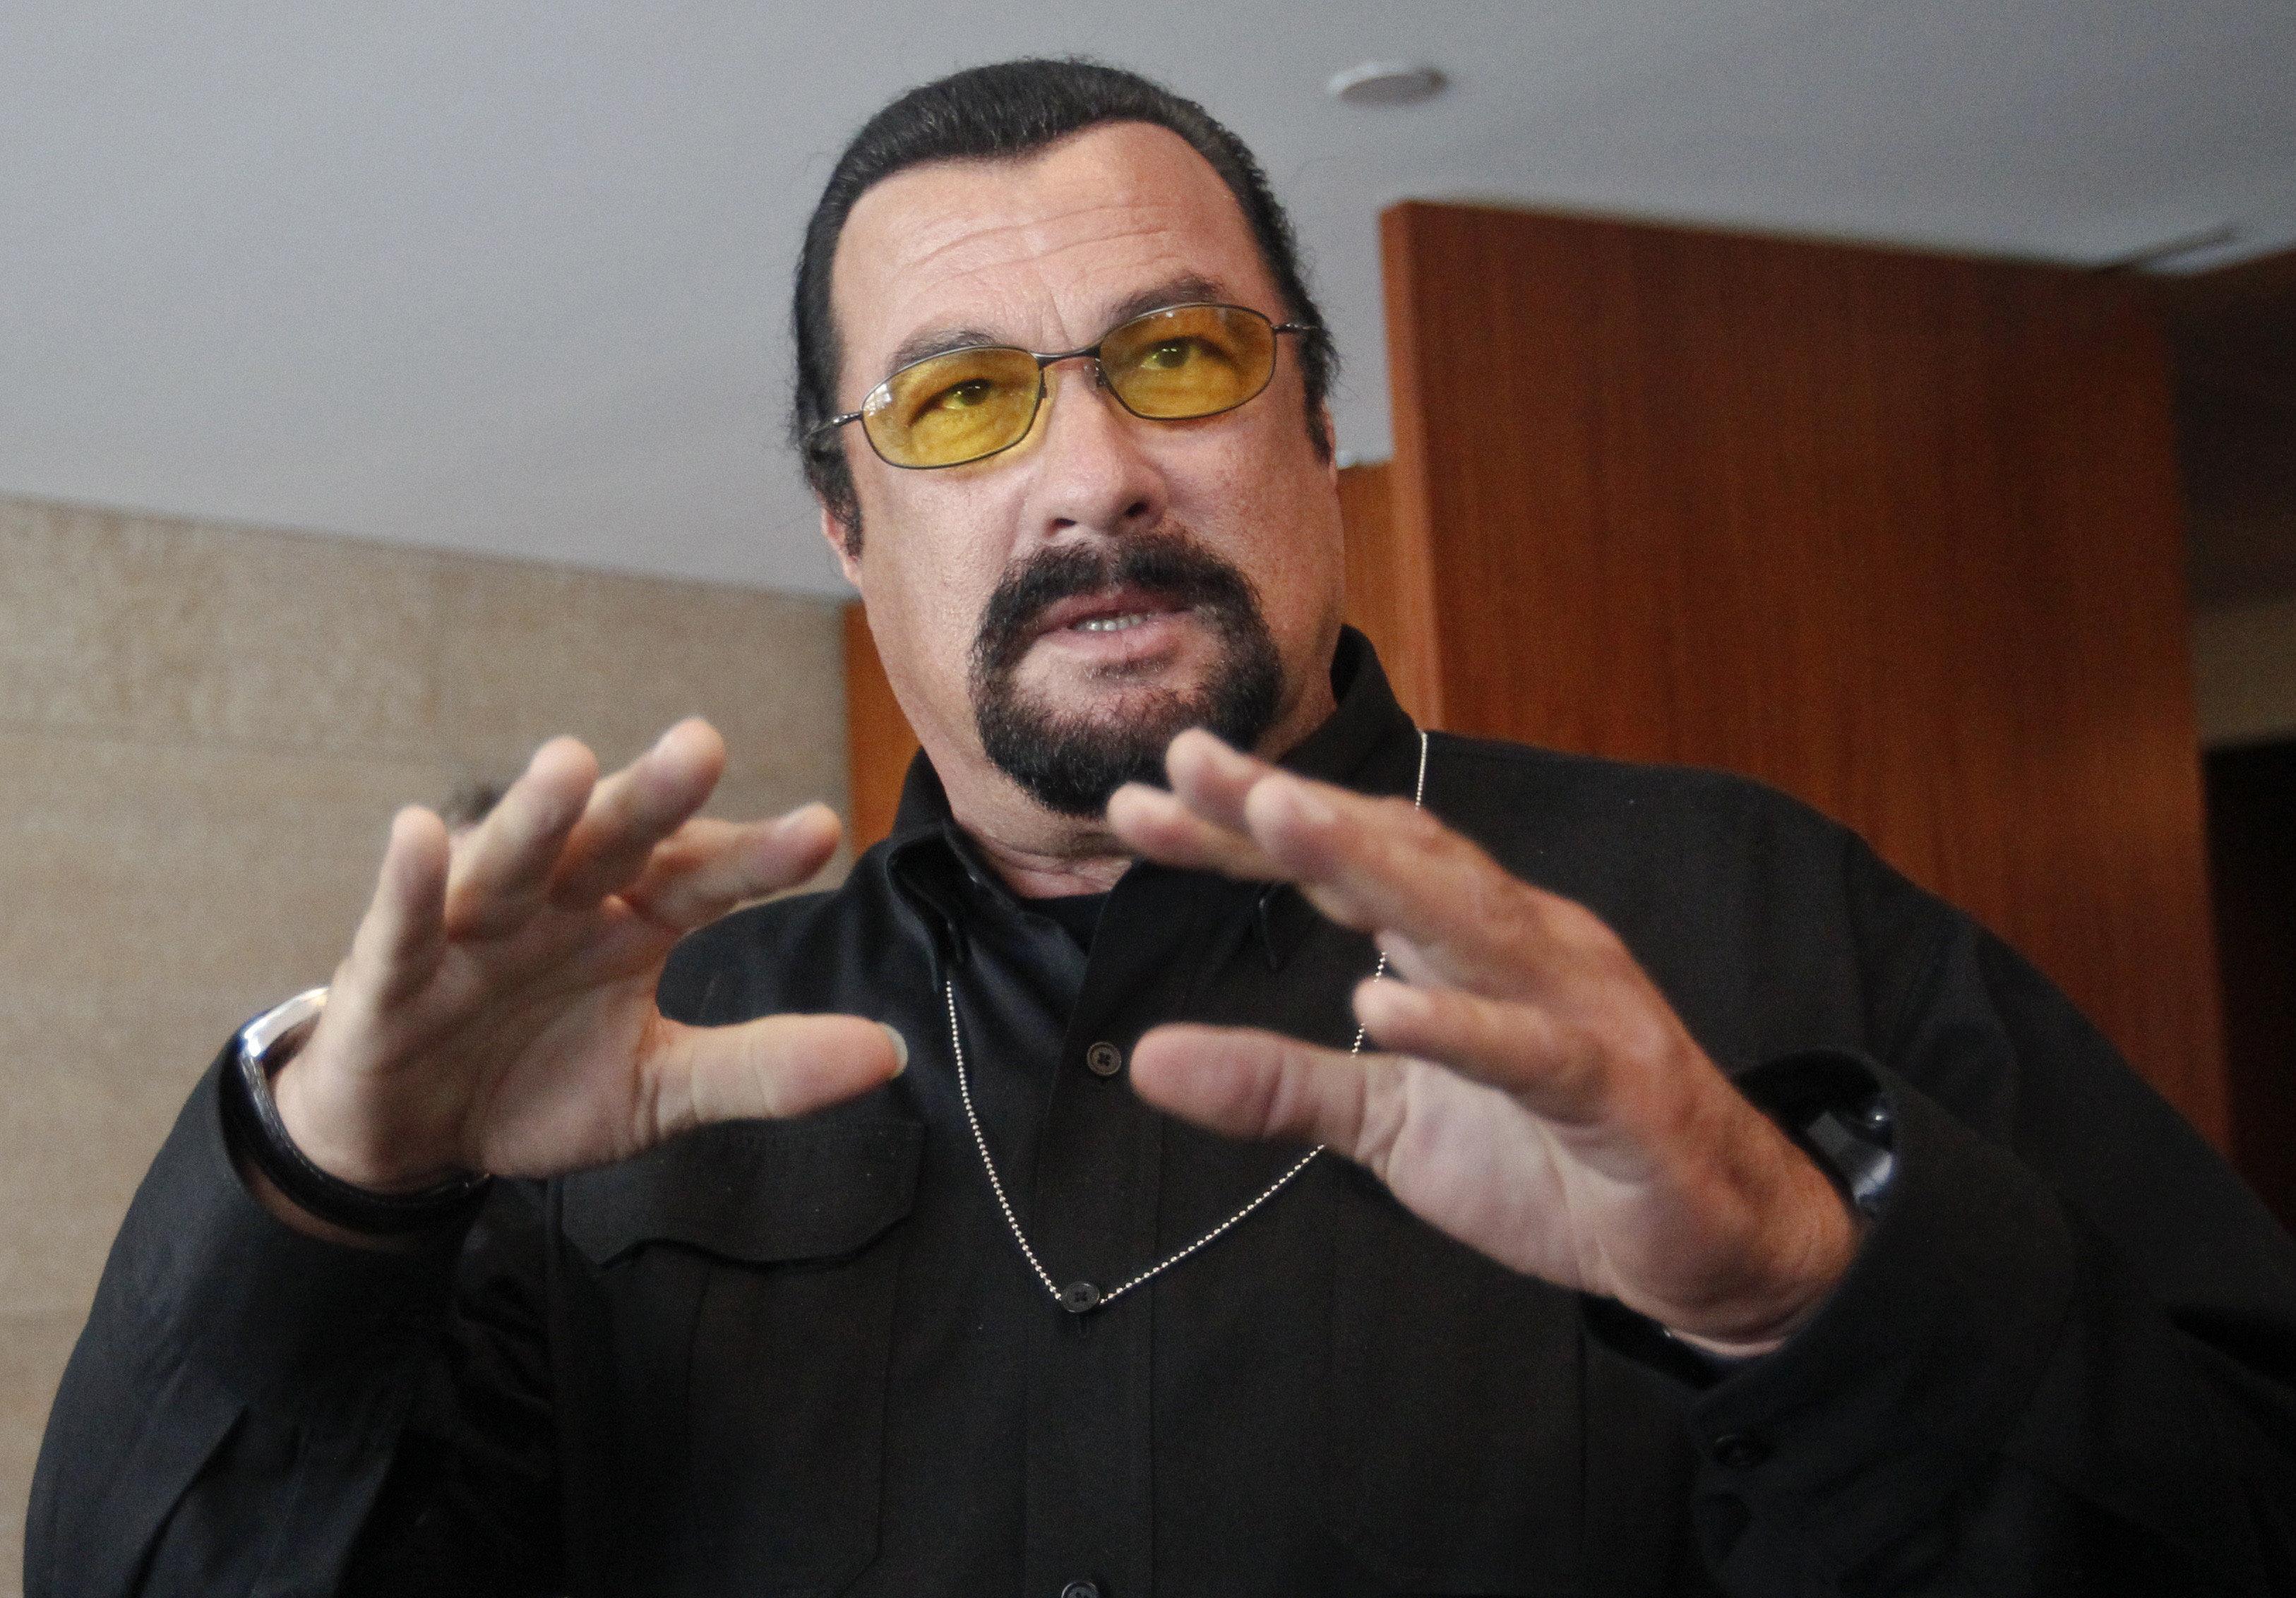 LAPD Launches Sexual Assault Investigation Against Steven